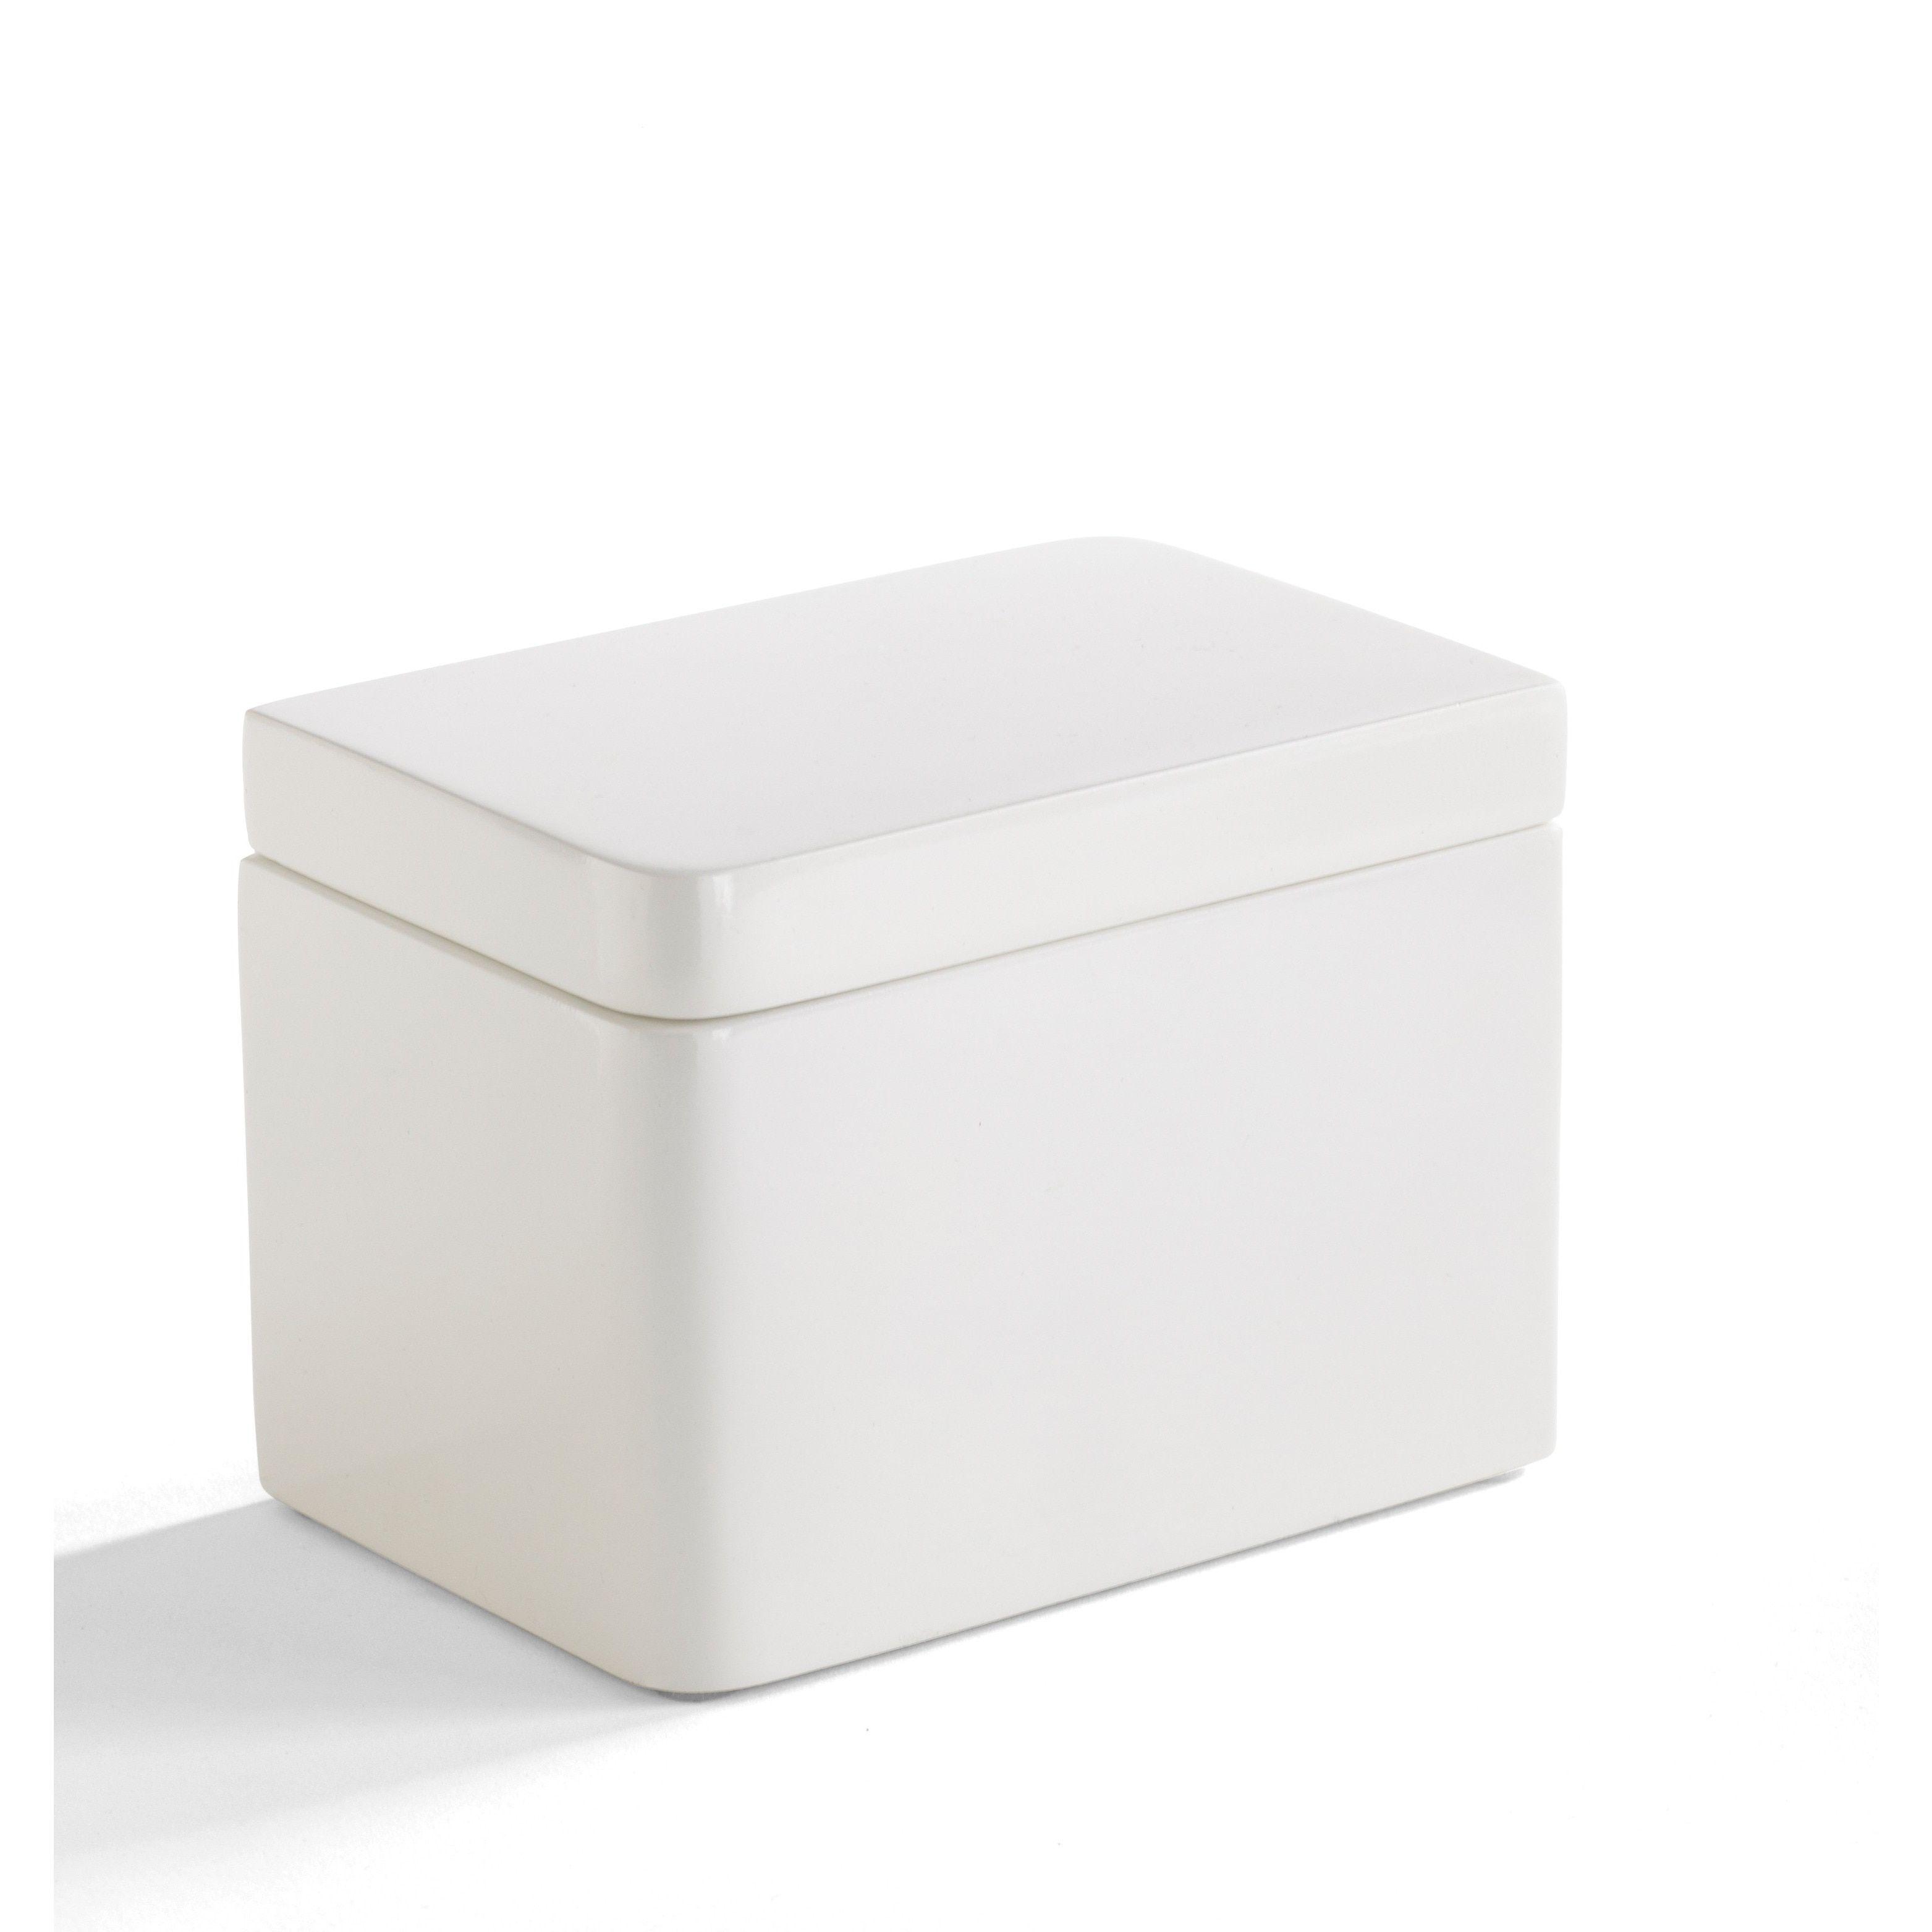 Solid Lacquer White Bath Accessory Collection (Lotion Dispenser ...